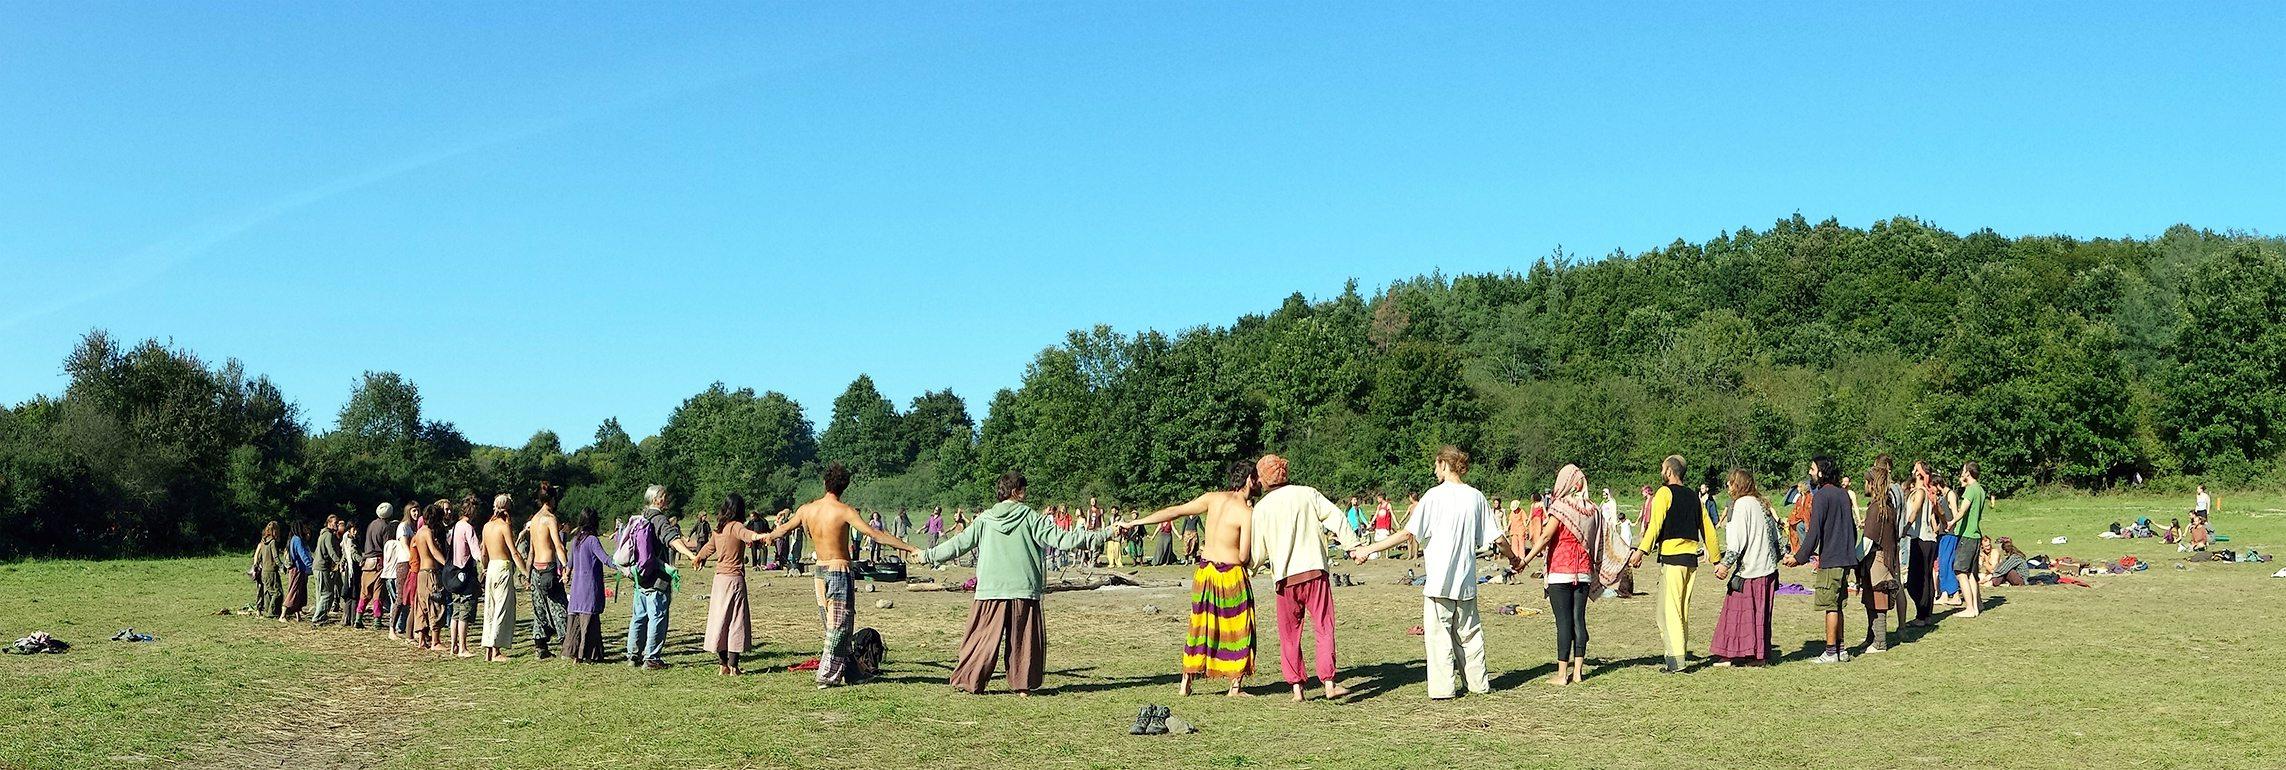 raibow-world-gathering-hungary-sun-valley-2014